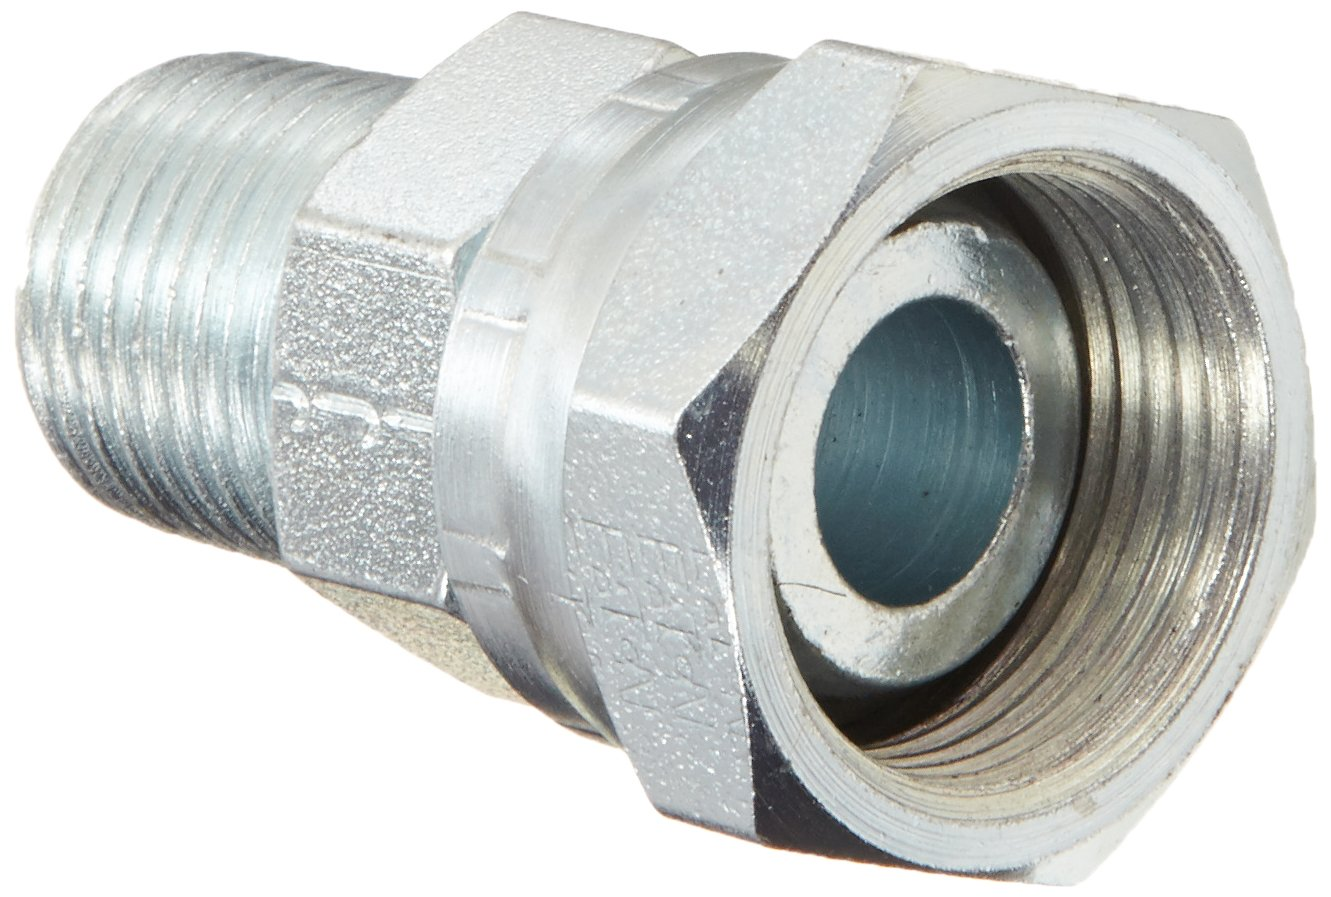 "Eaton Weatherhead 9205X12X8 Carbon Steel Fitting, Swivel, Adapter, 3/4"" NPSM Female x 1/2"" NPT Male"